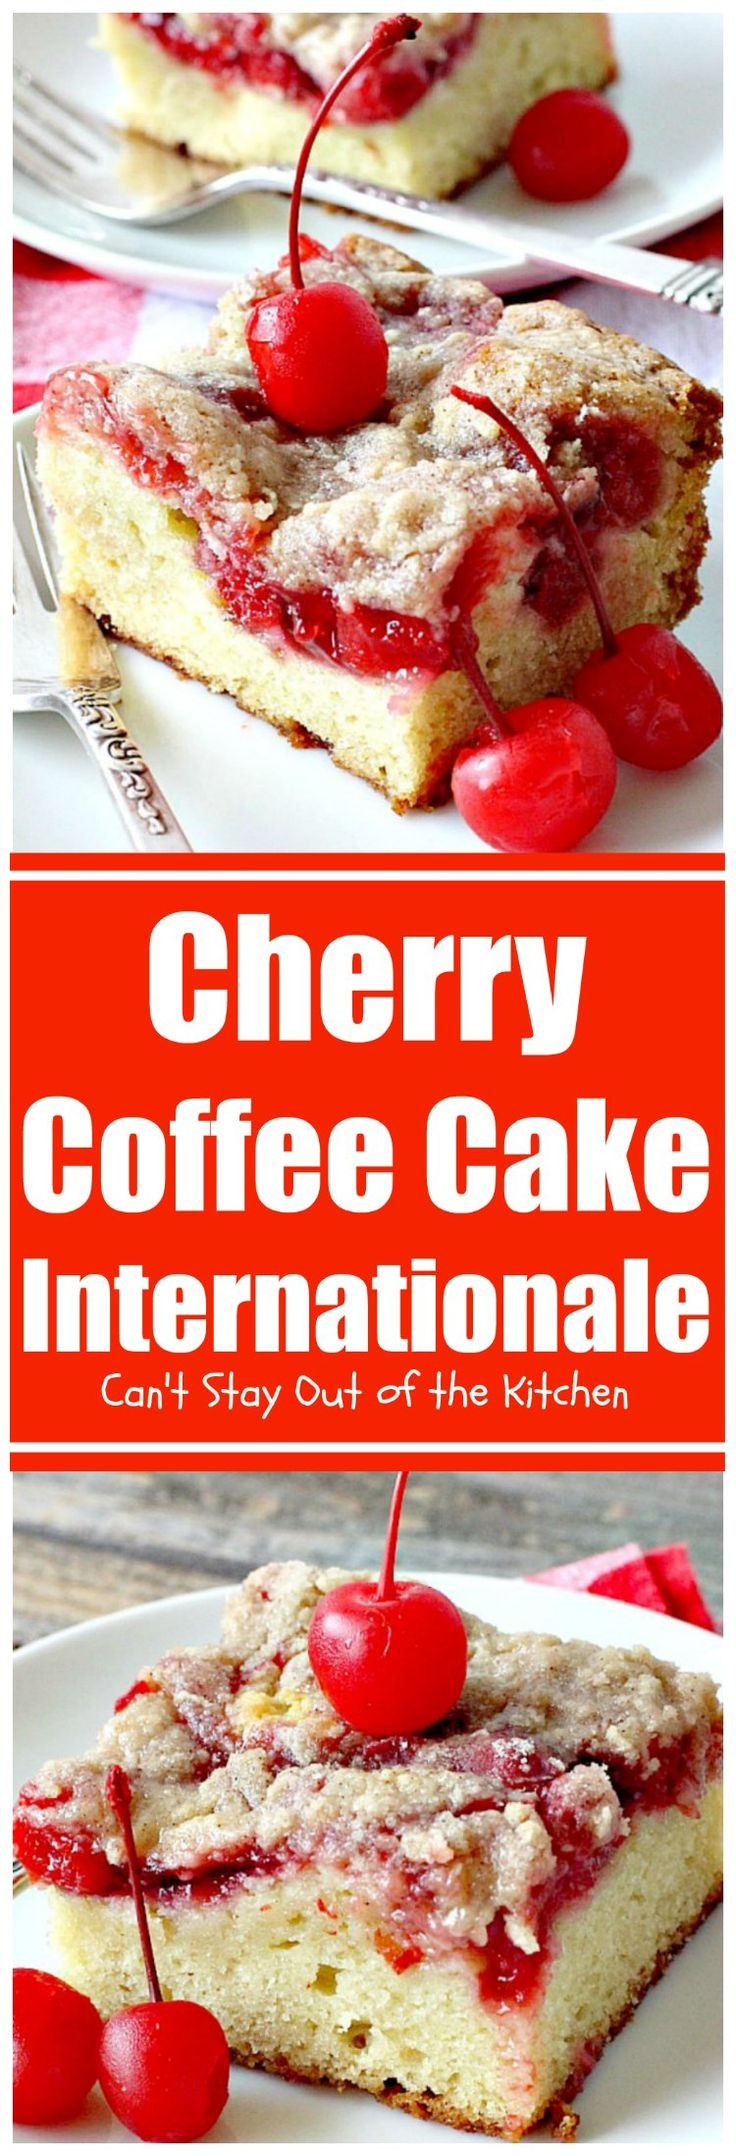 Cherry Coffee Cake Internationale